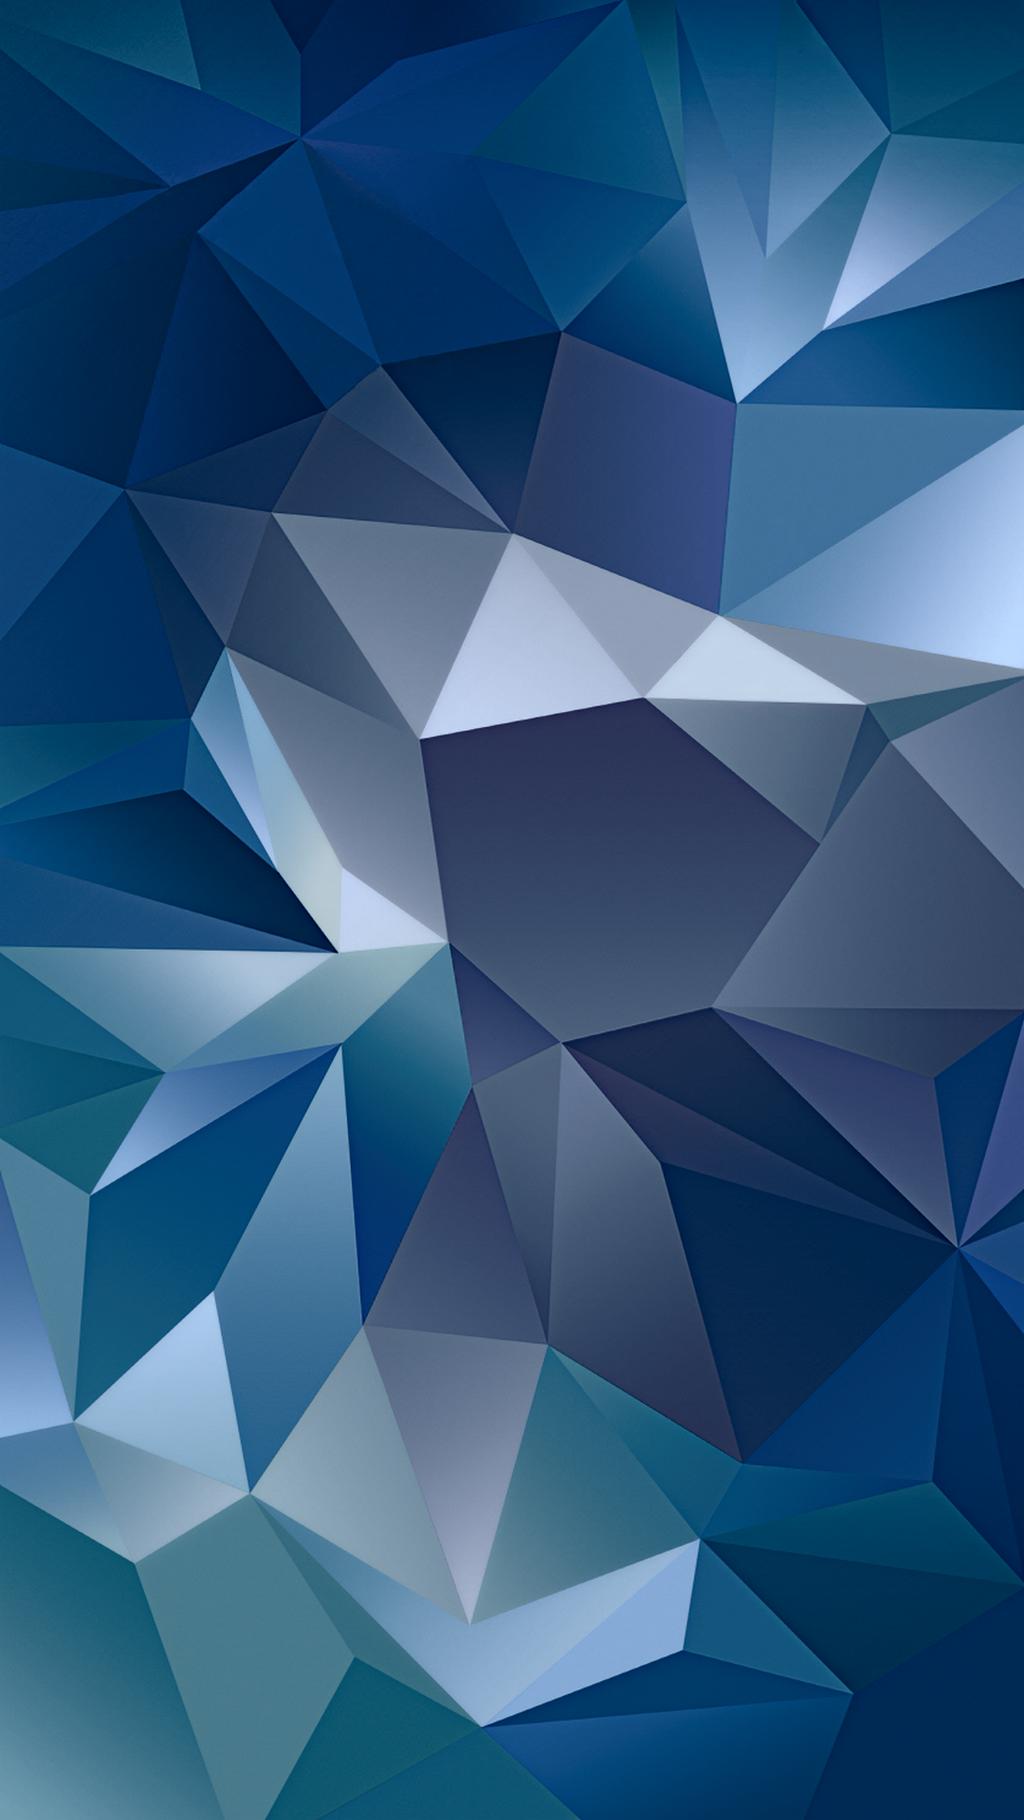 S5 wallpaper apk download 1024x1820